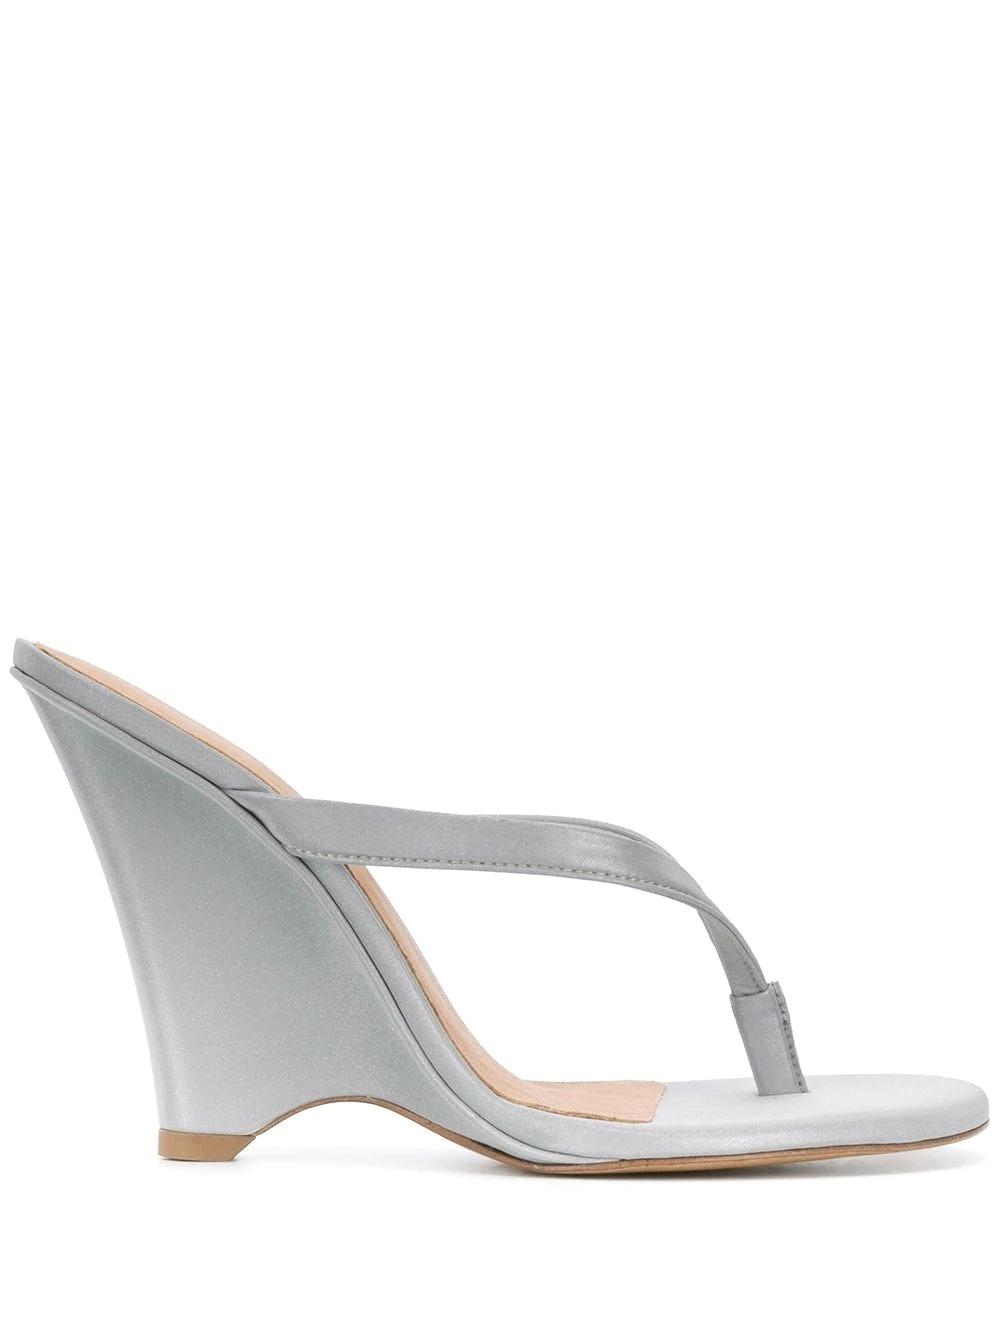 Yeezy 110 Wedge Thong Sandals